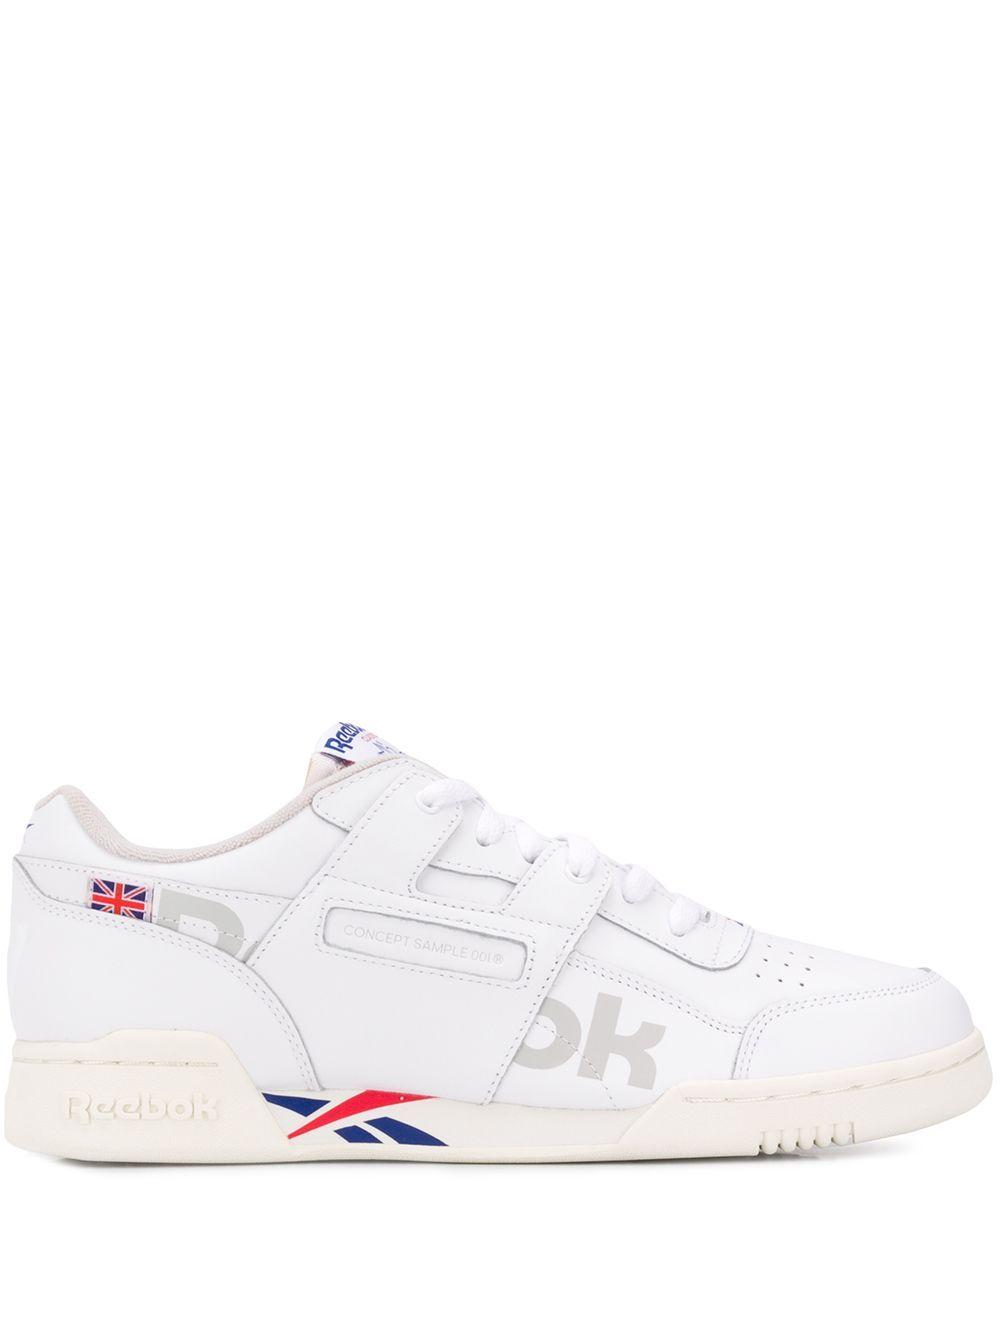 641b97fec7ec REEBOK REEBOK CONTRAST LOGO SNEAKERS - WHITE.  reebok  shoes ...